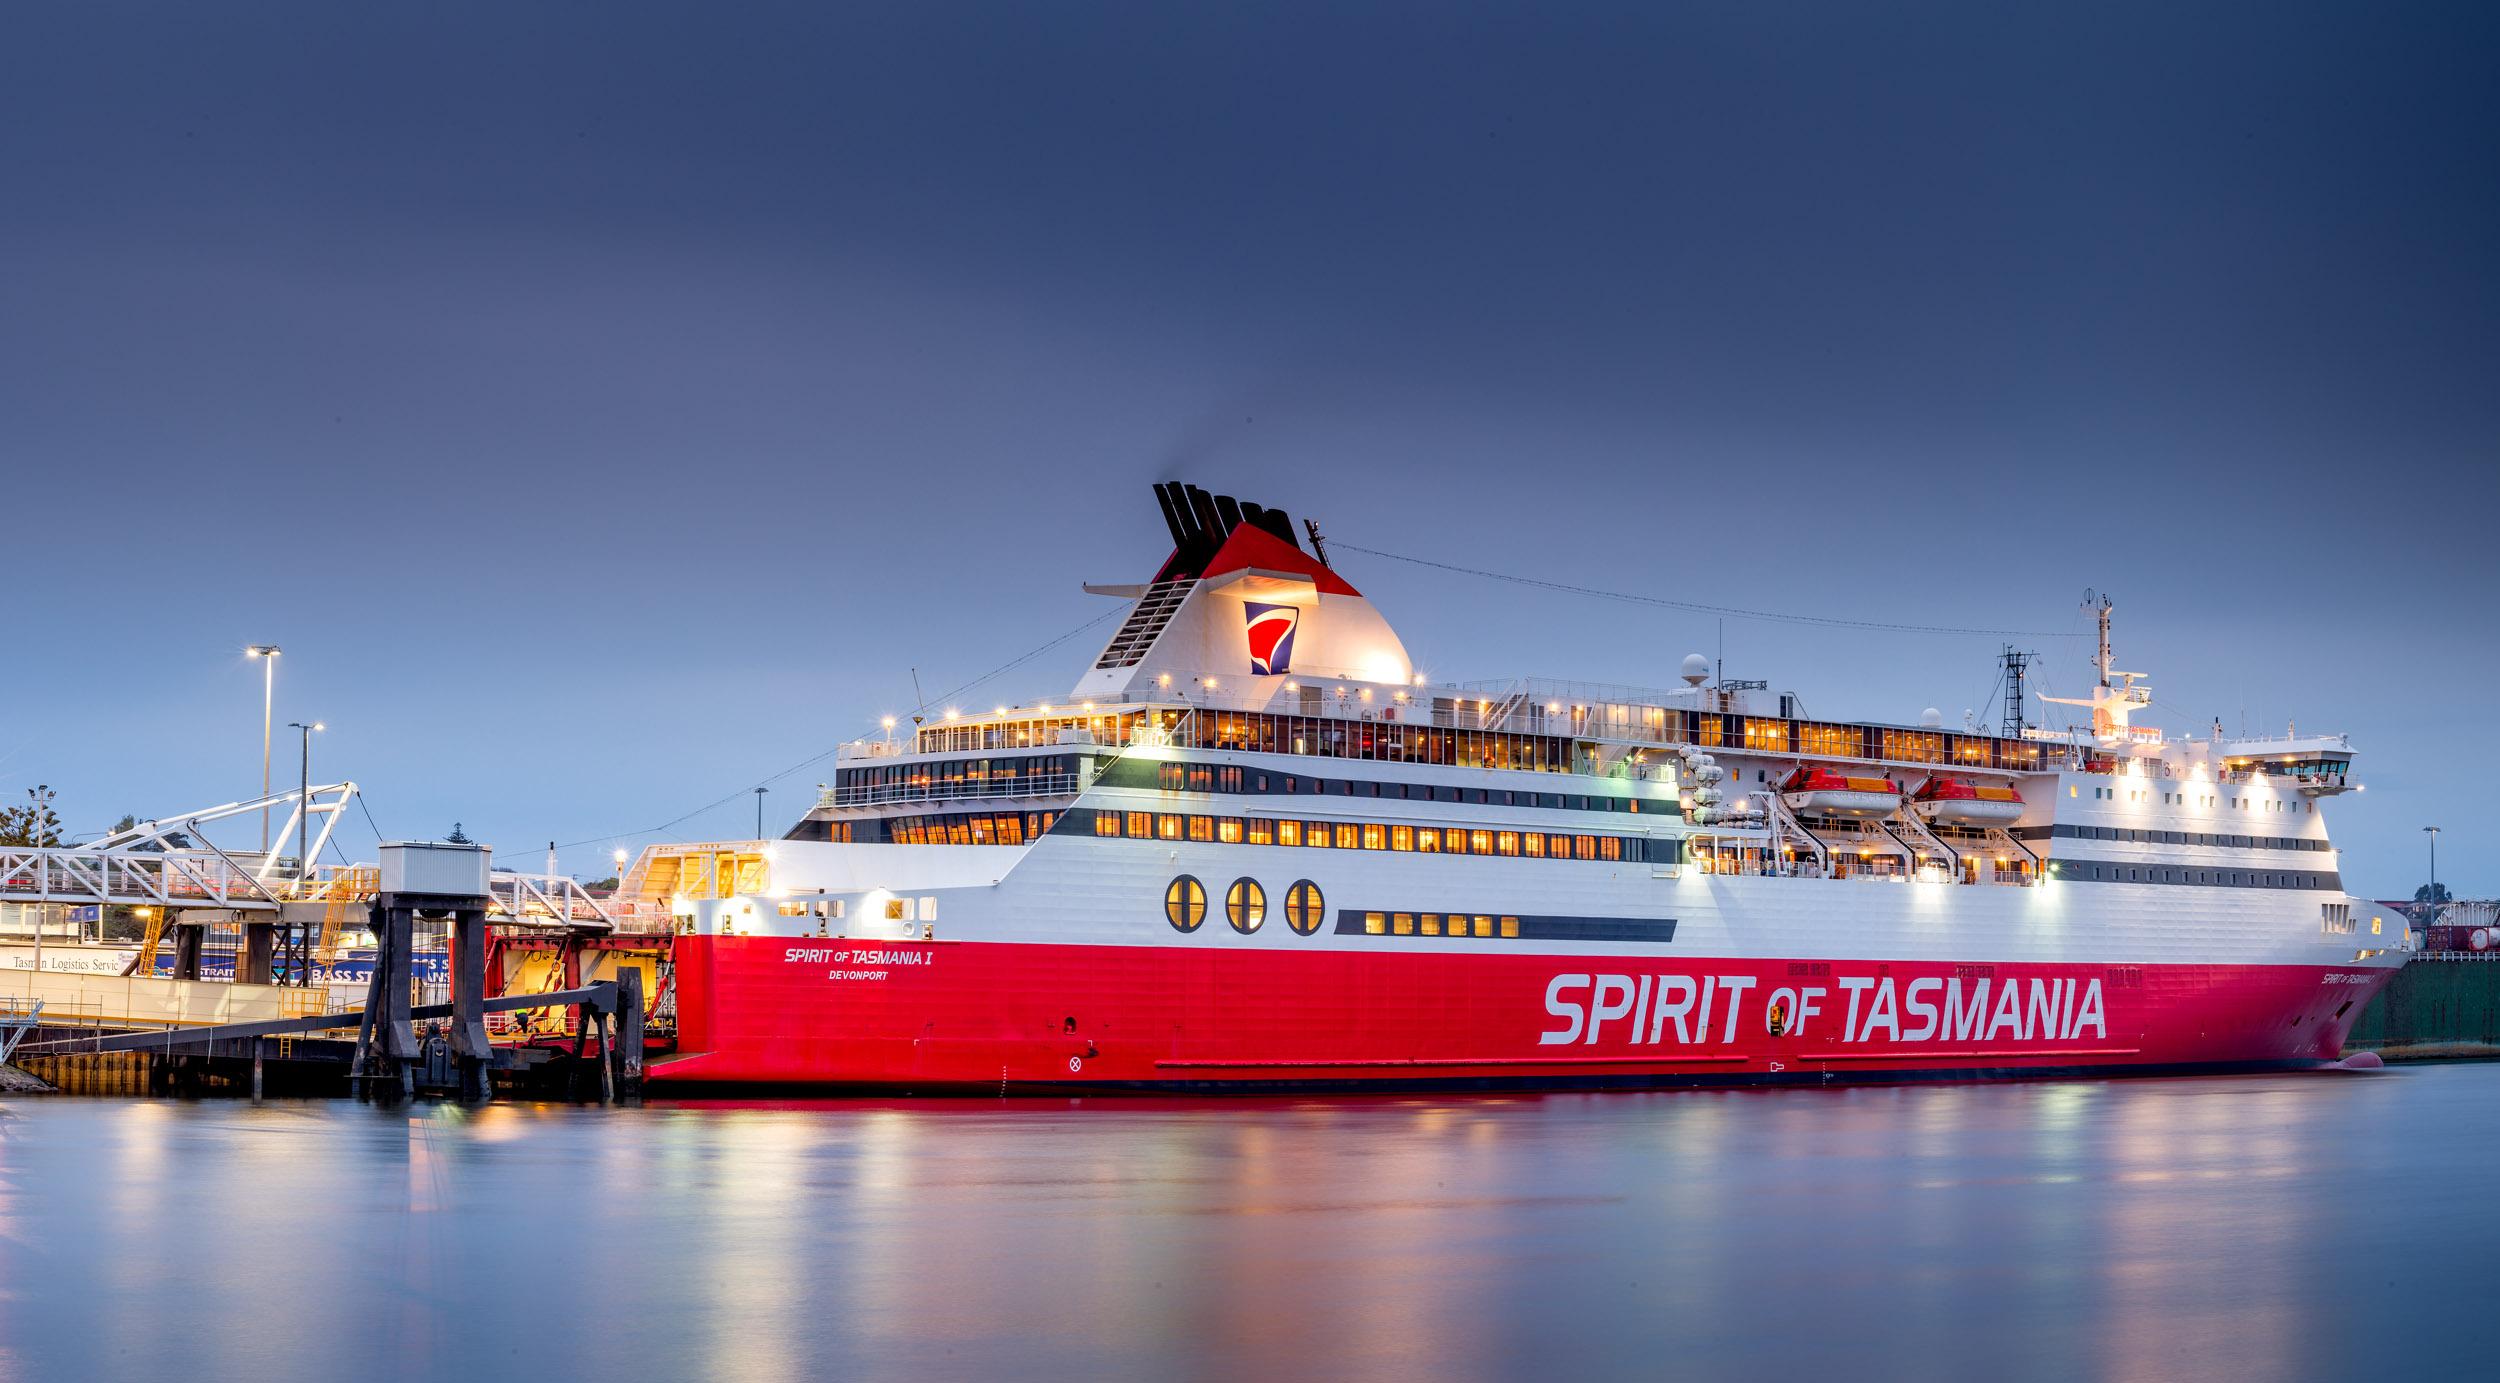 spirit-of-tasmania-Panorama-devonport.jpg